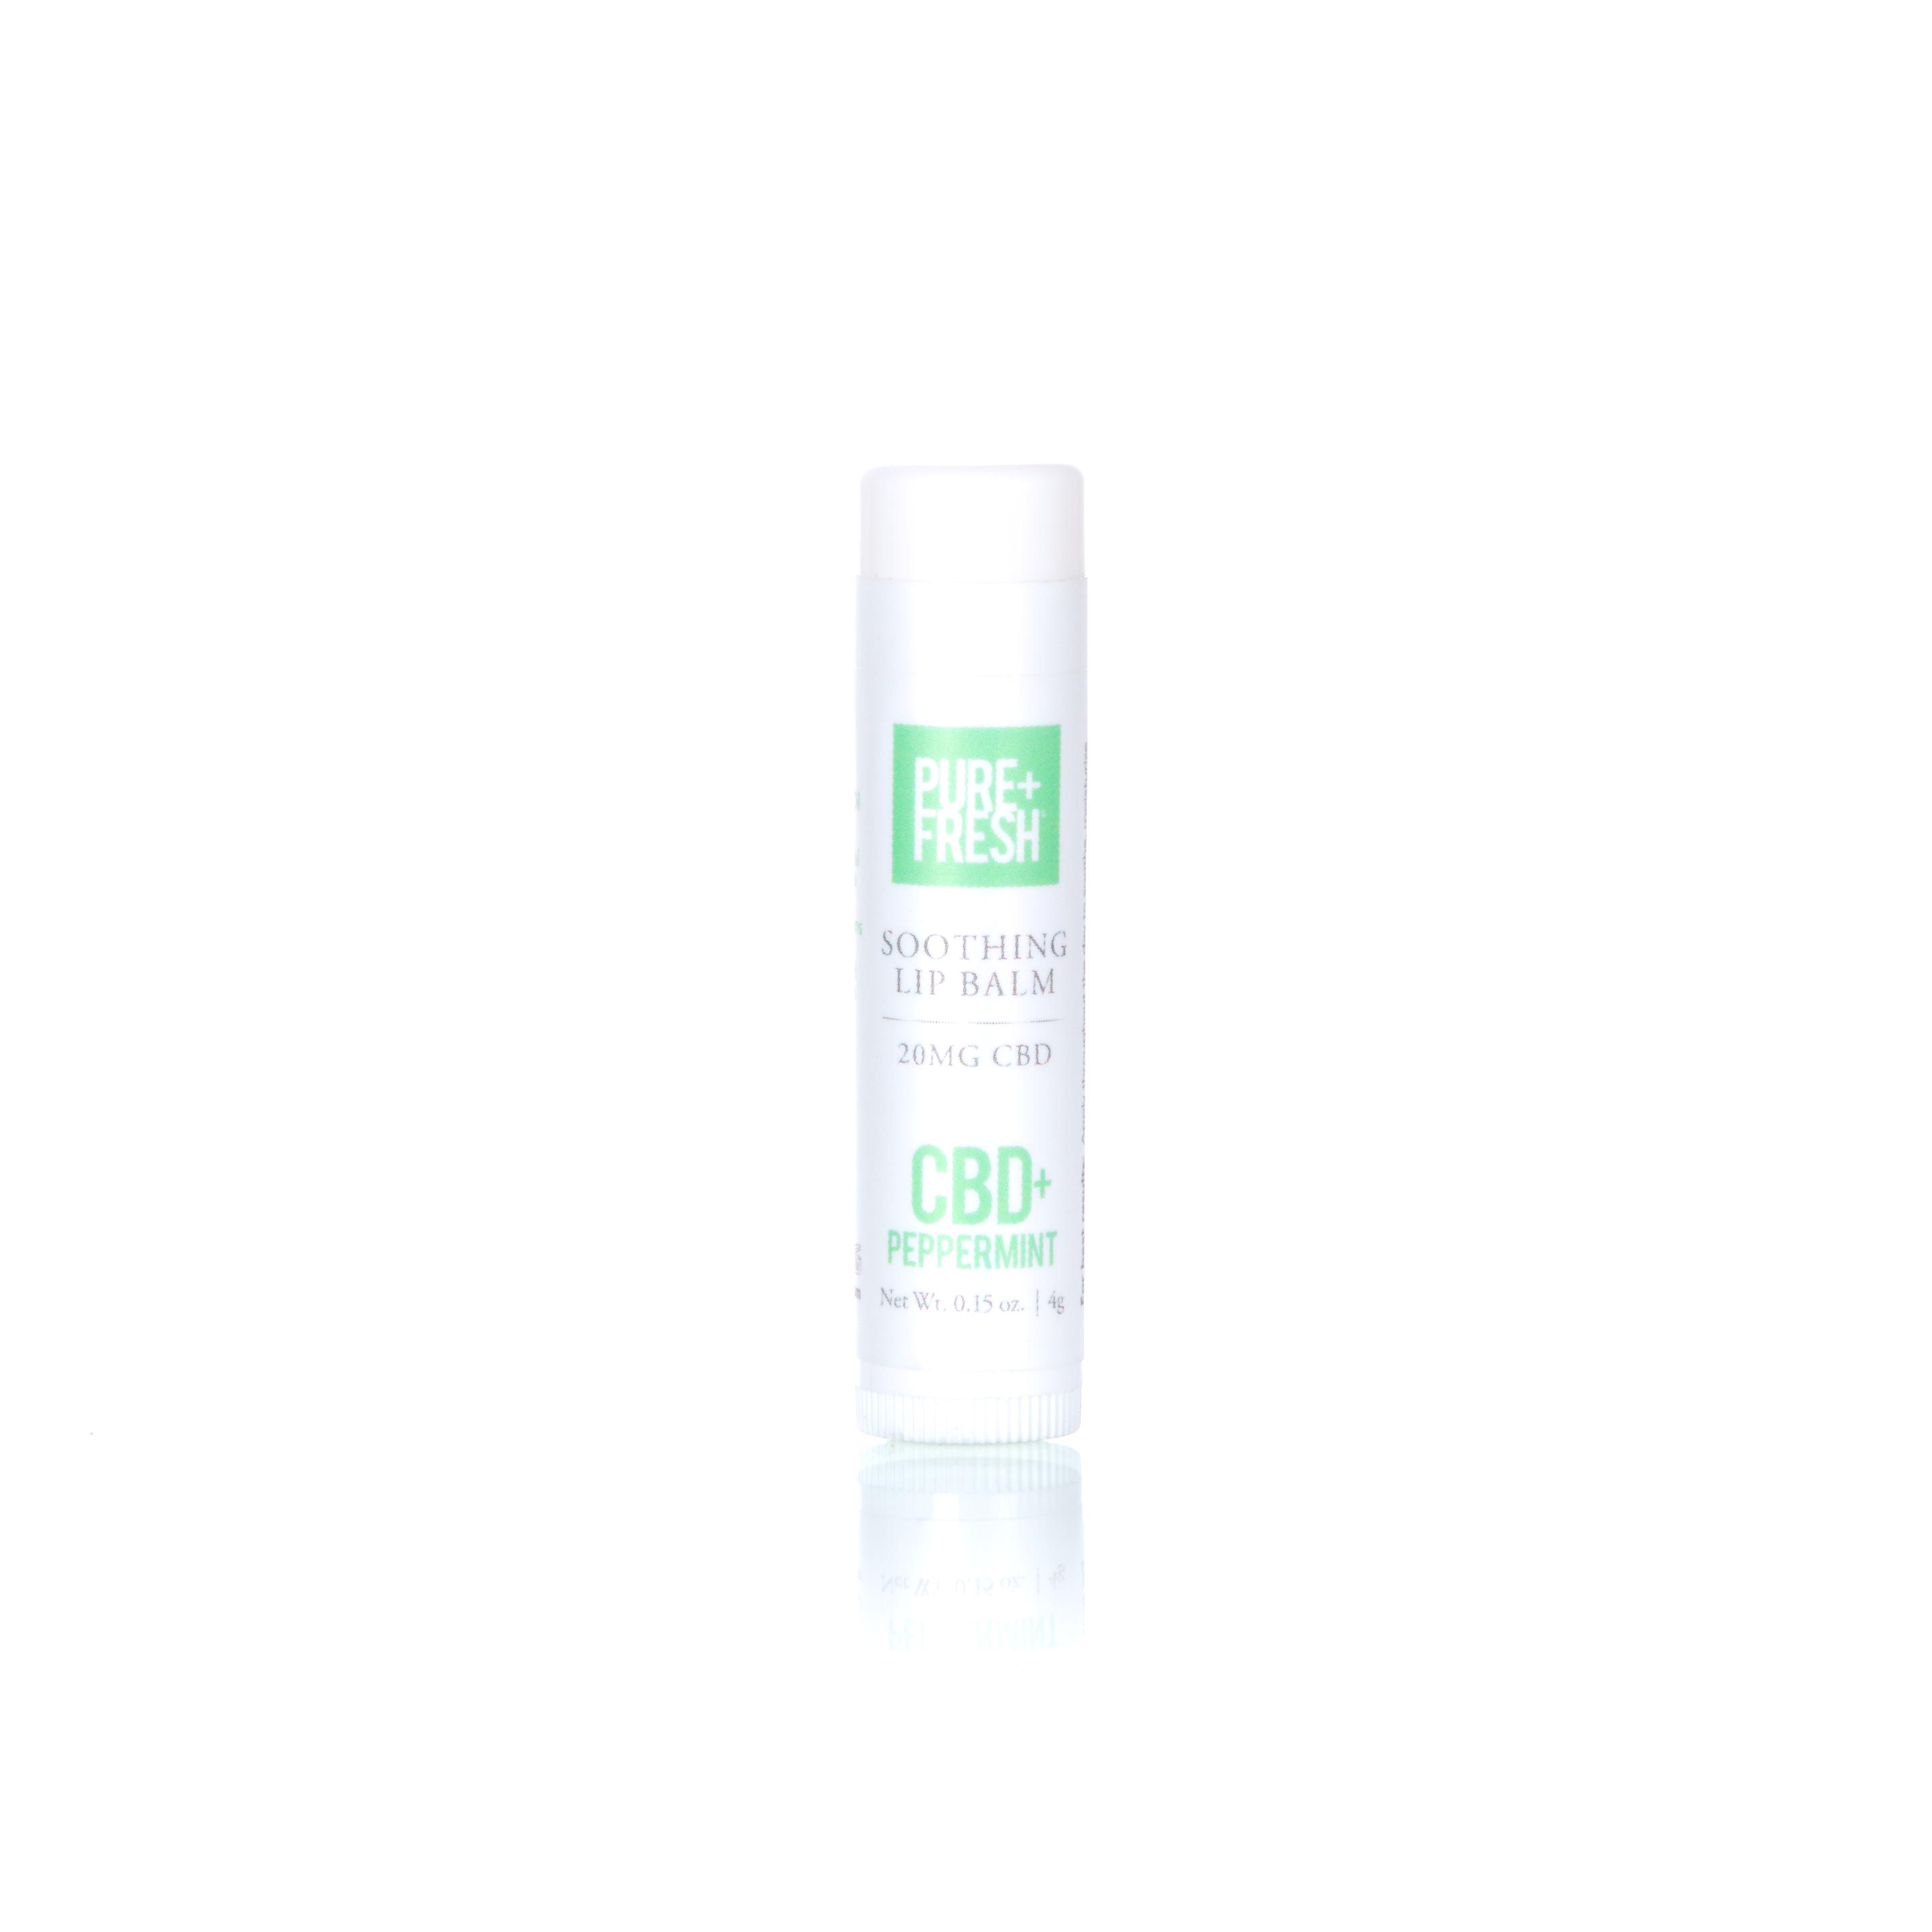 Pure+Fresh CBD Lip Balm